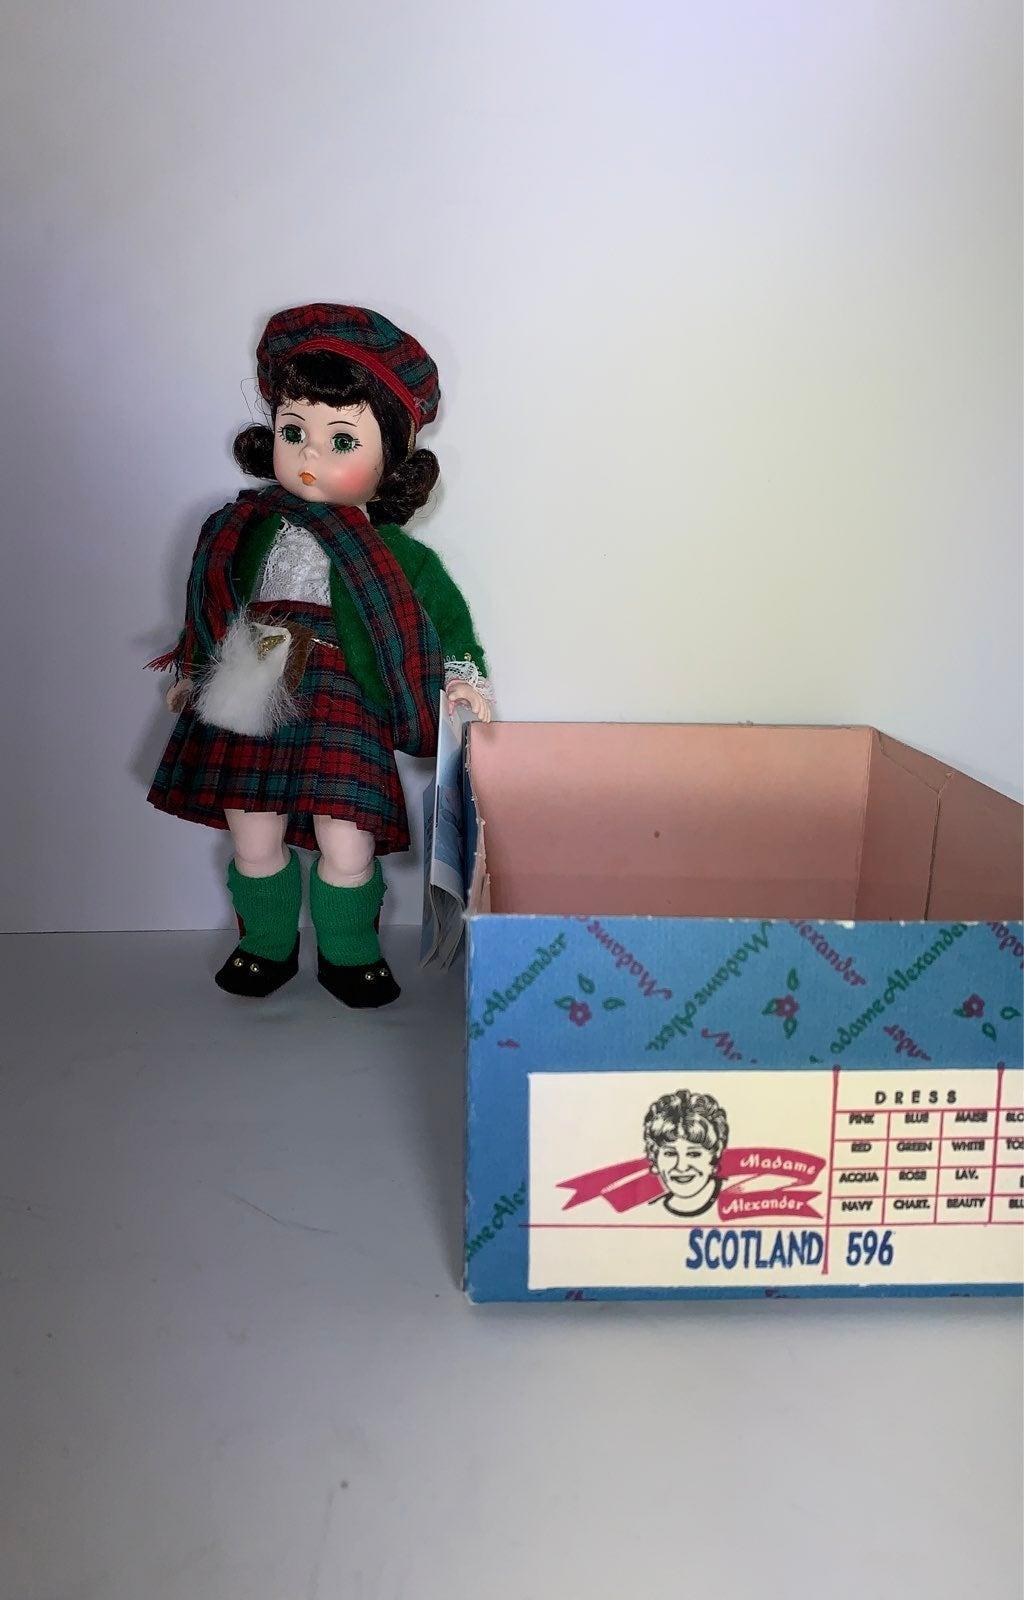 Madame Alexander Doll Scotland #596